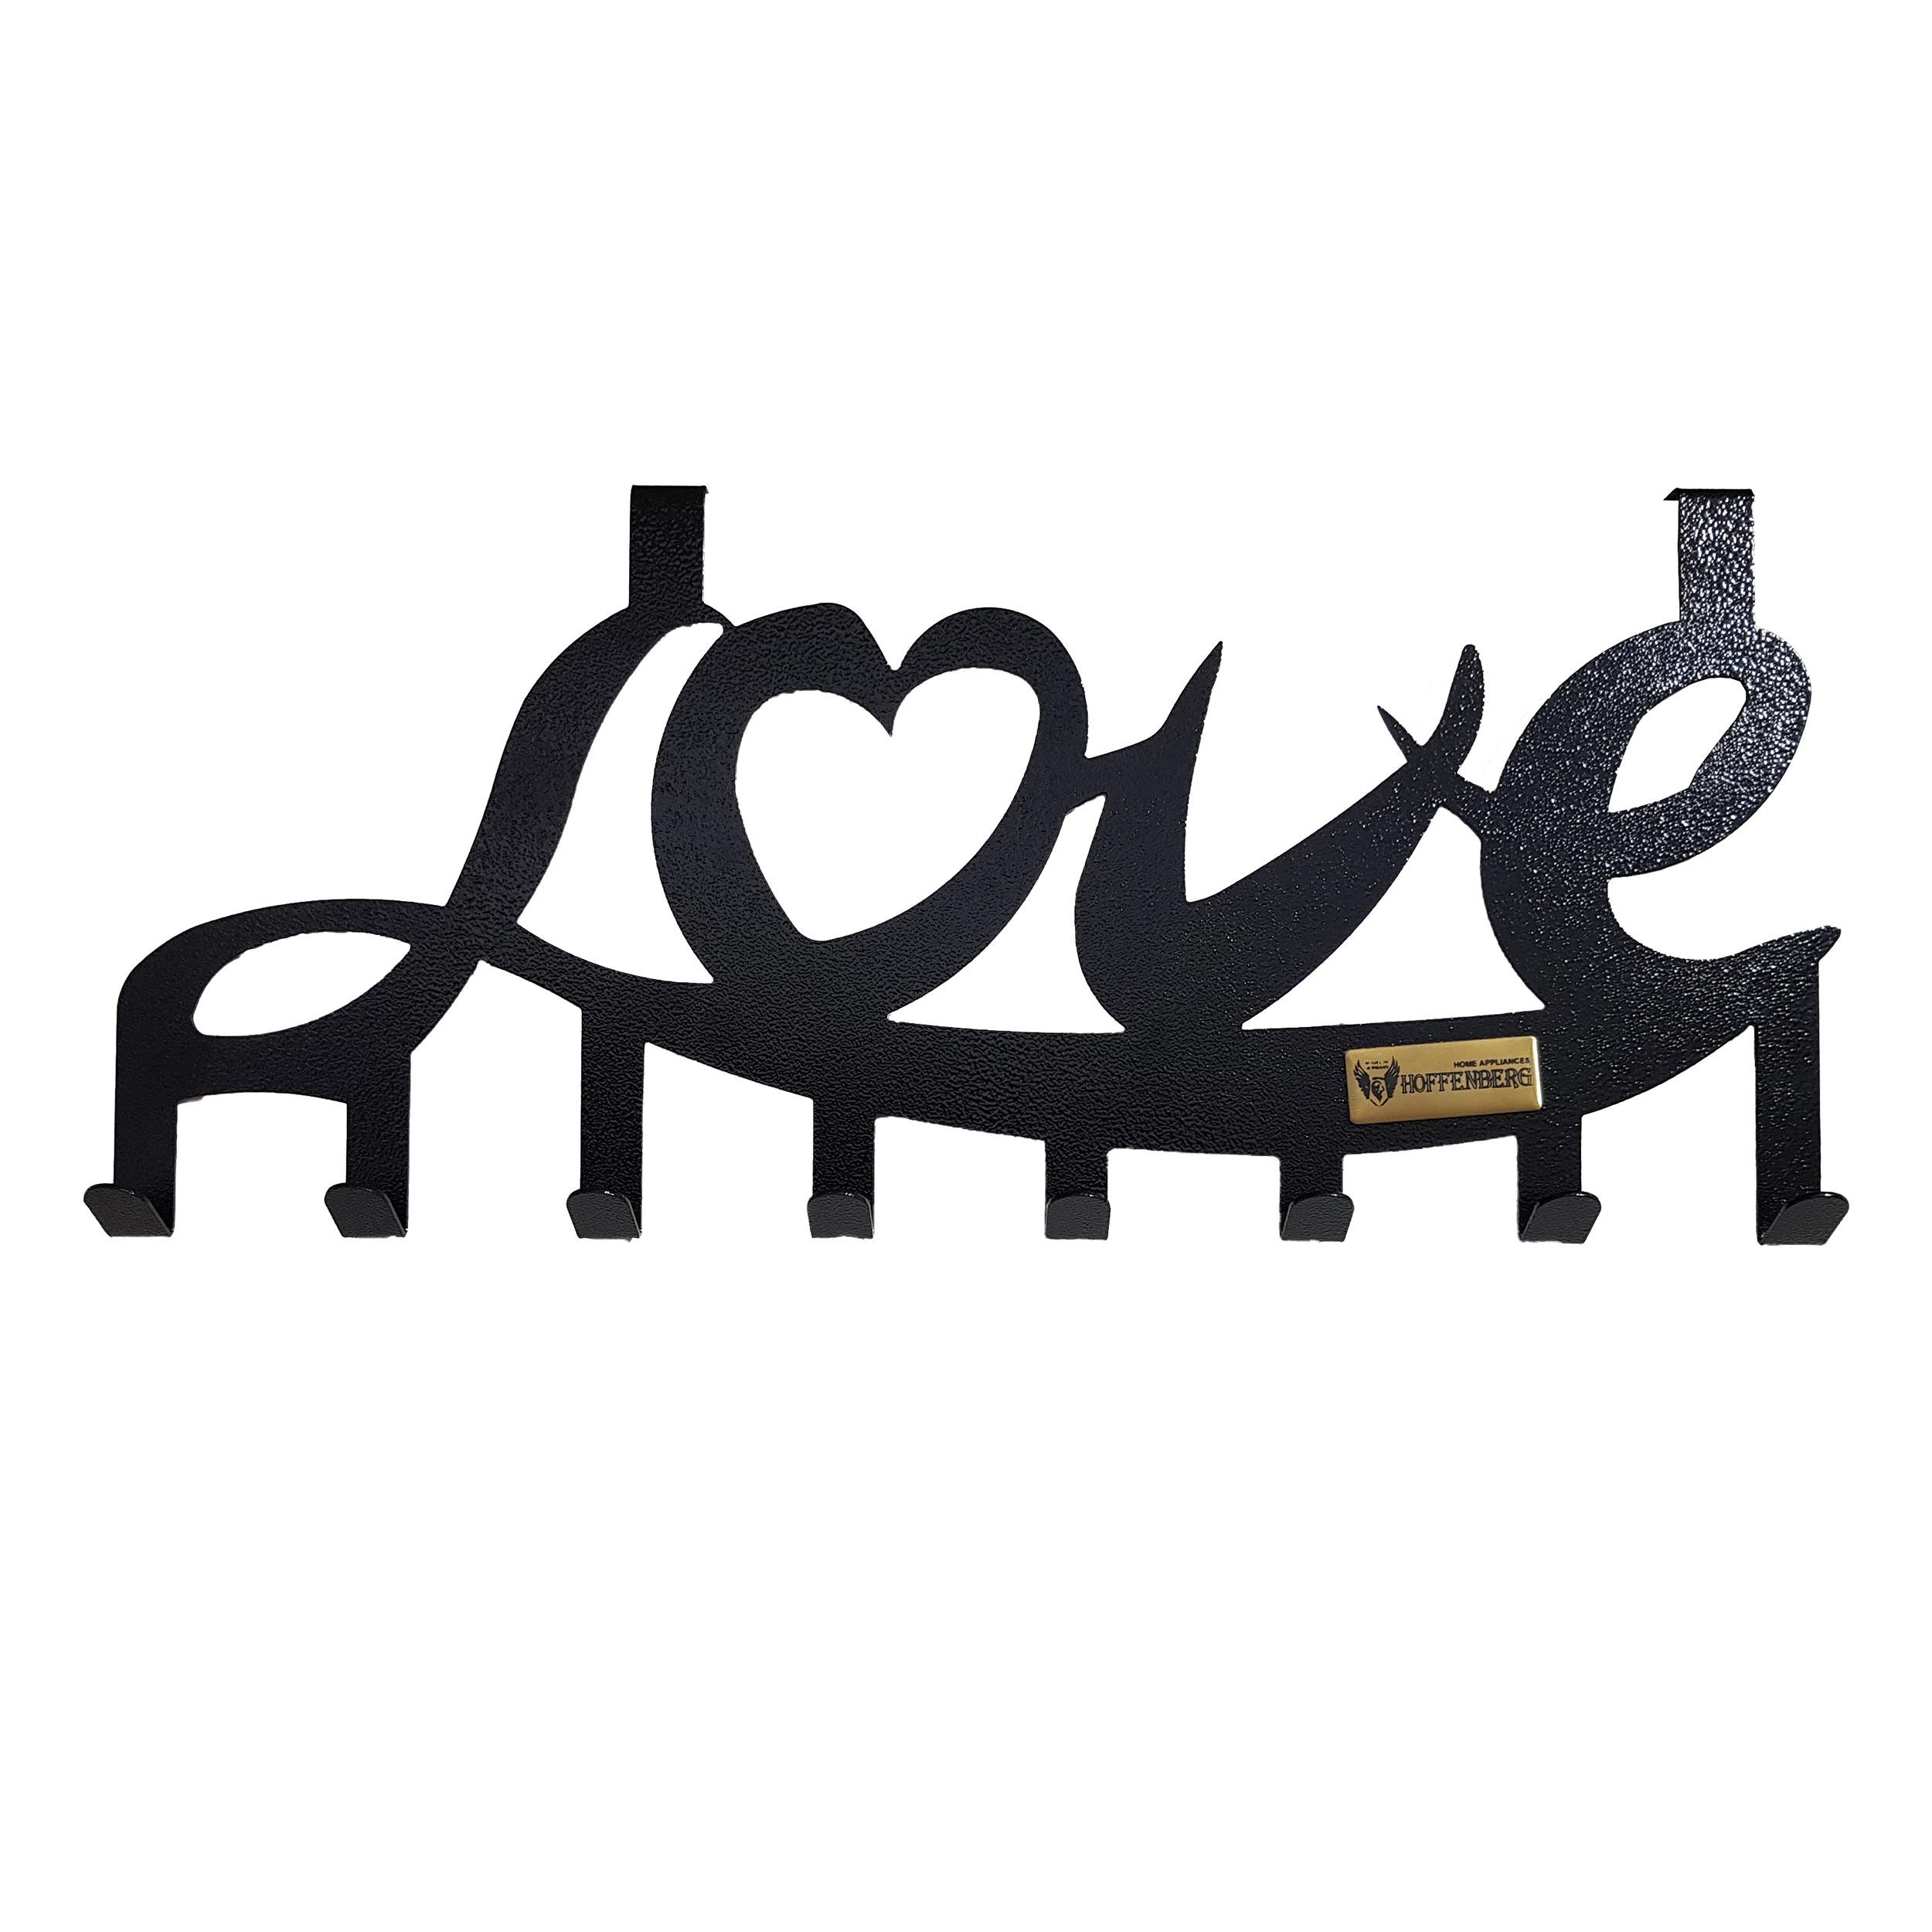 آویز لباس هافنبرگ مدل Love